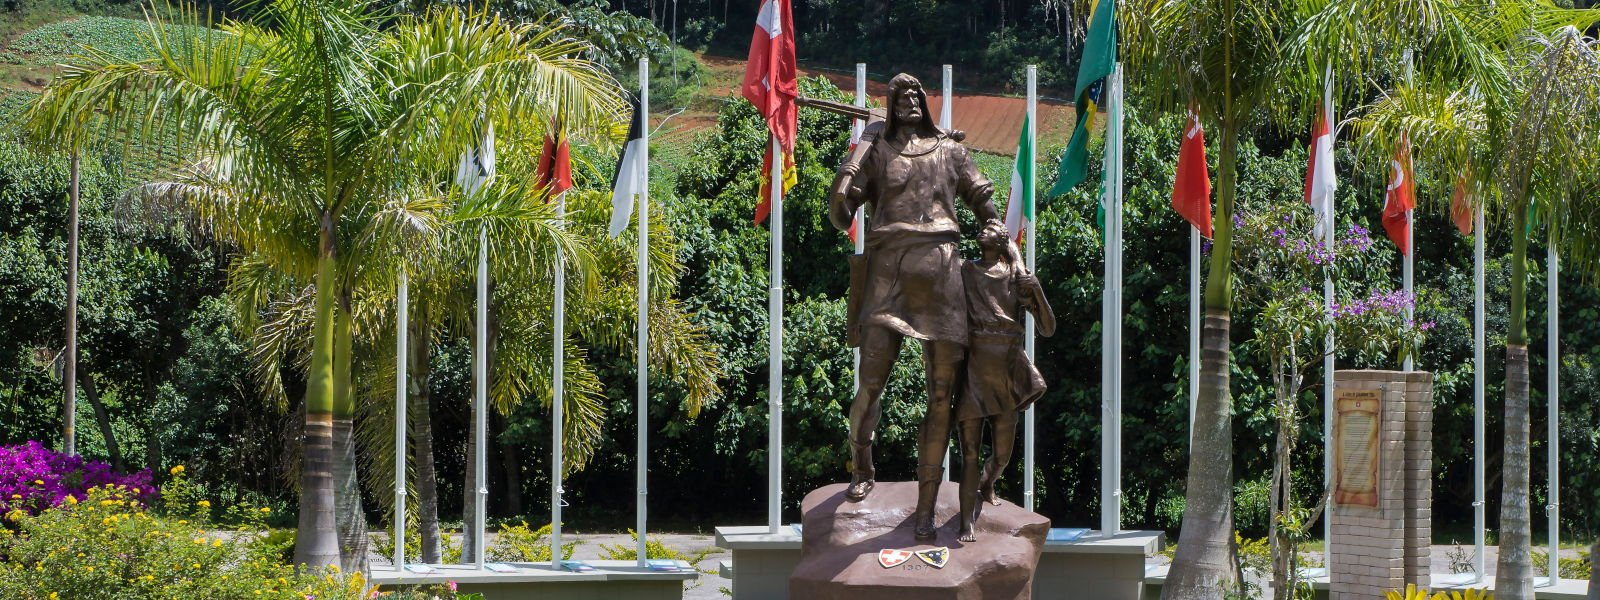 Estátua de Guilherme Tel - foto por Regina Lo Bianco